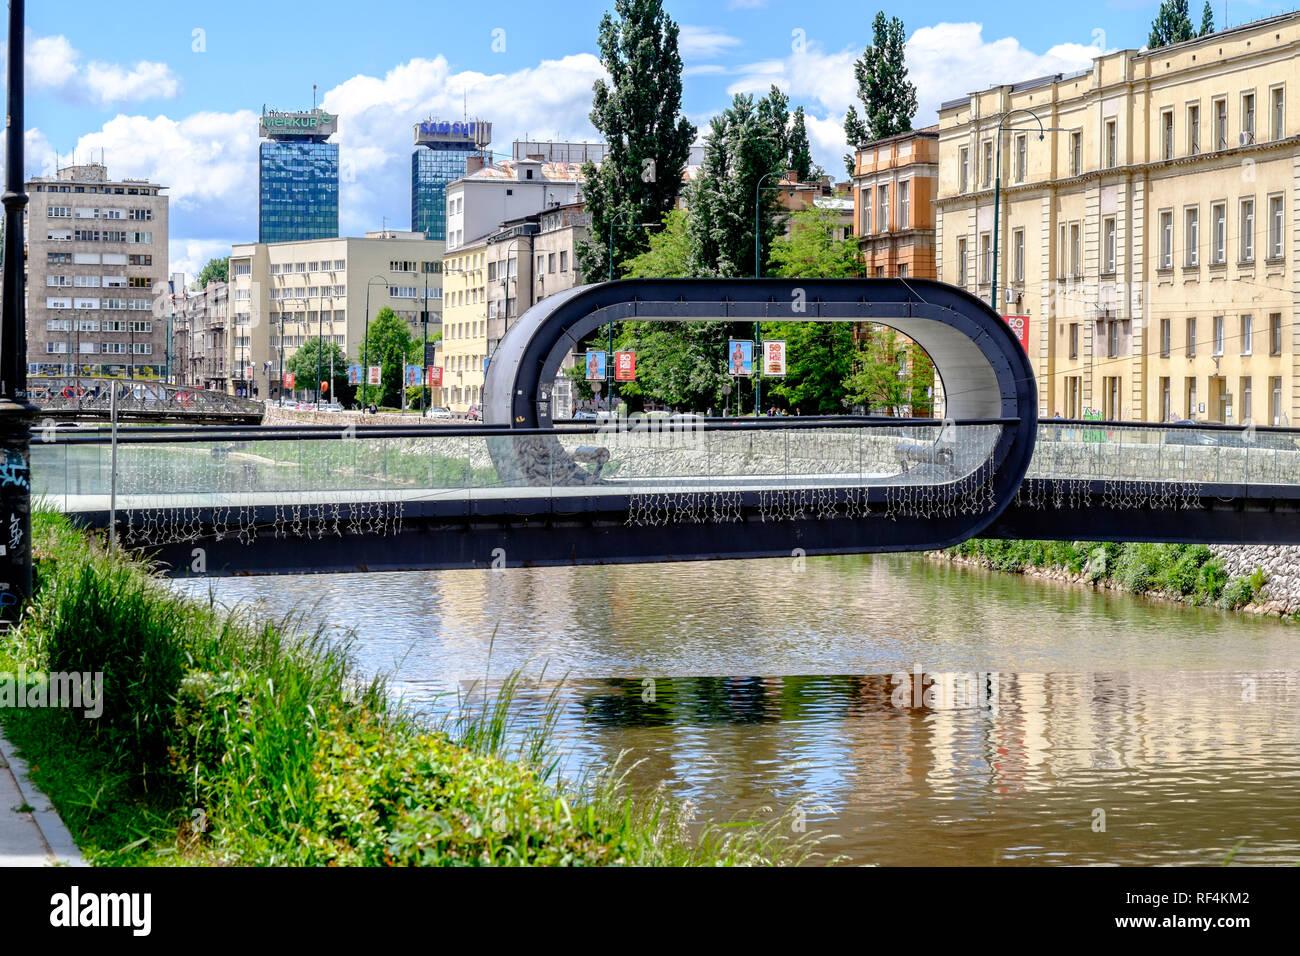 Festina Lente (Latin for 'make haste slowly') bridge over the Miljacka river in Sarajevo - the funky loop design exhorts pedestrians to enjoy the view - Stock Image